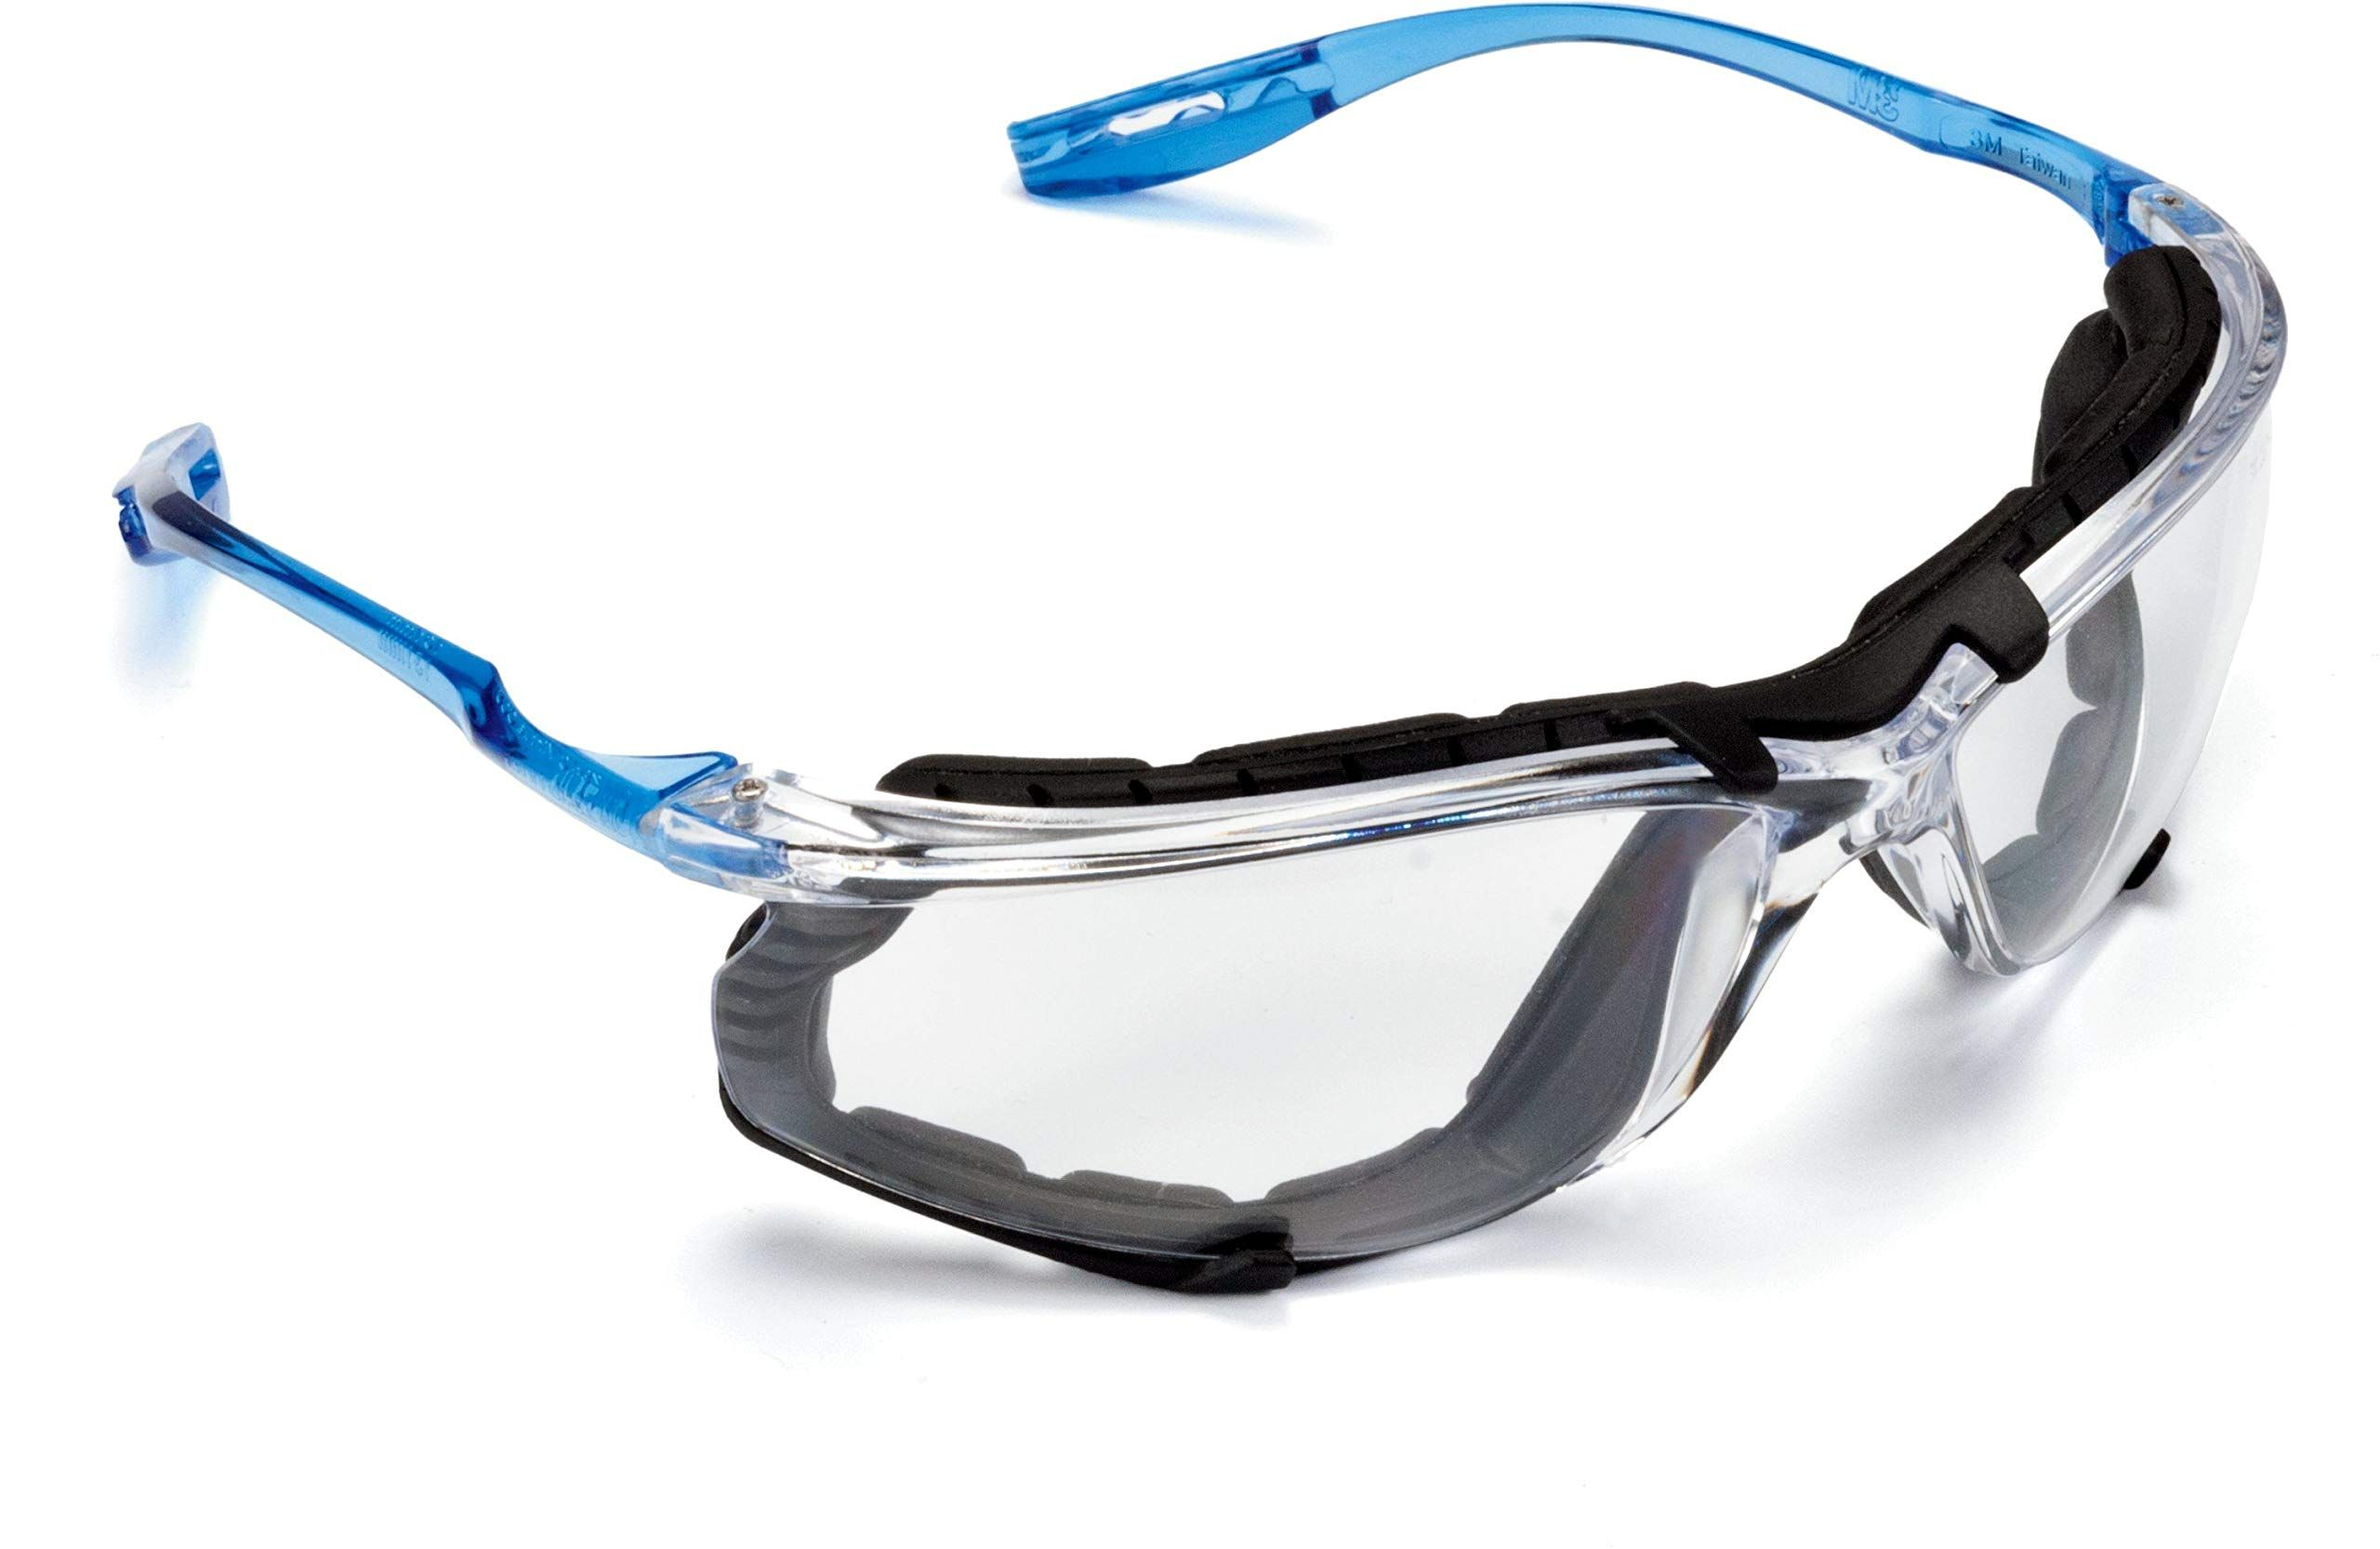 3m safety glasses virtua ccs protective eyewear 11872